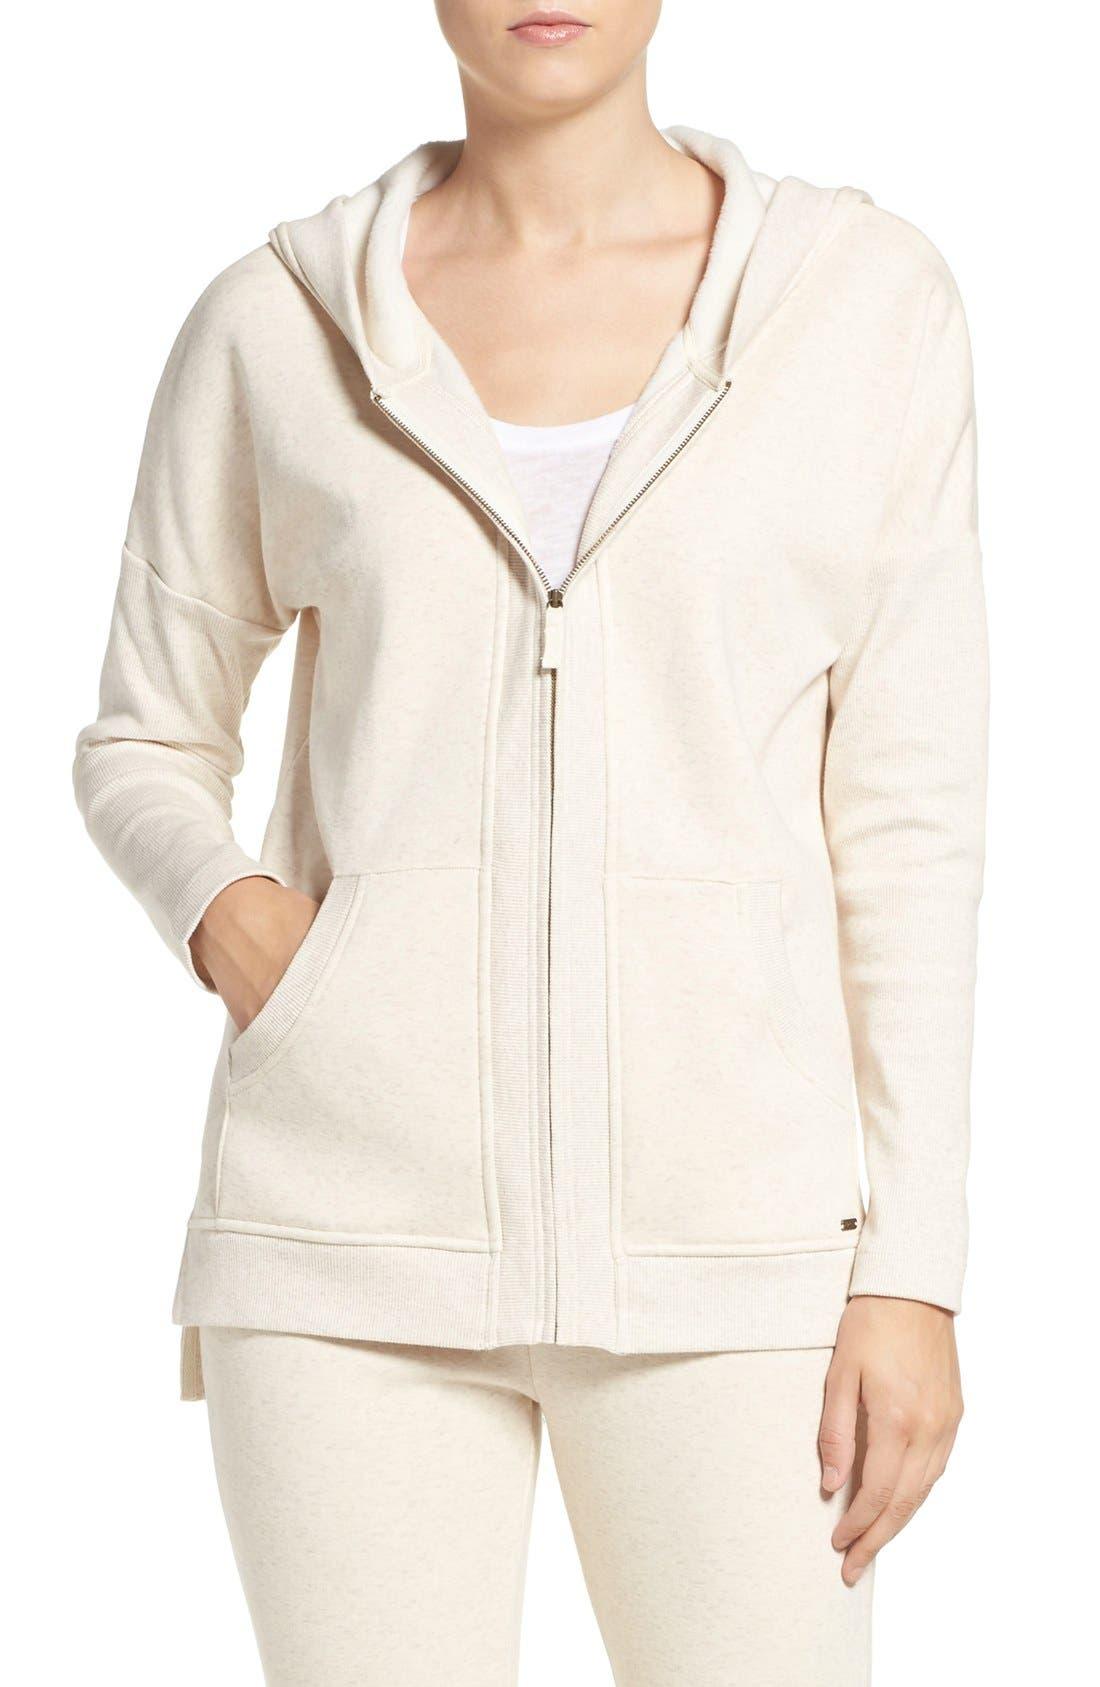 Main Image - UGG® 'Mavis' Stretch Cotton Zip-Up Hoodie